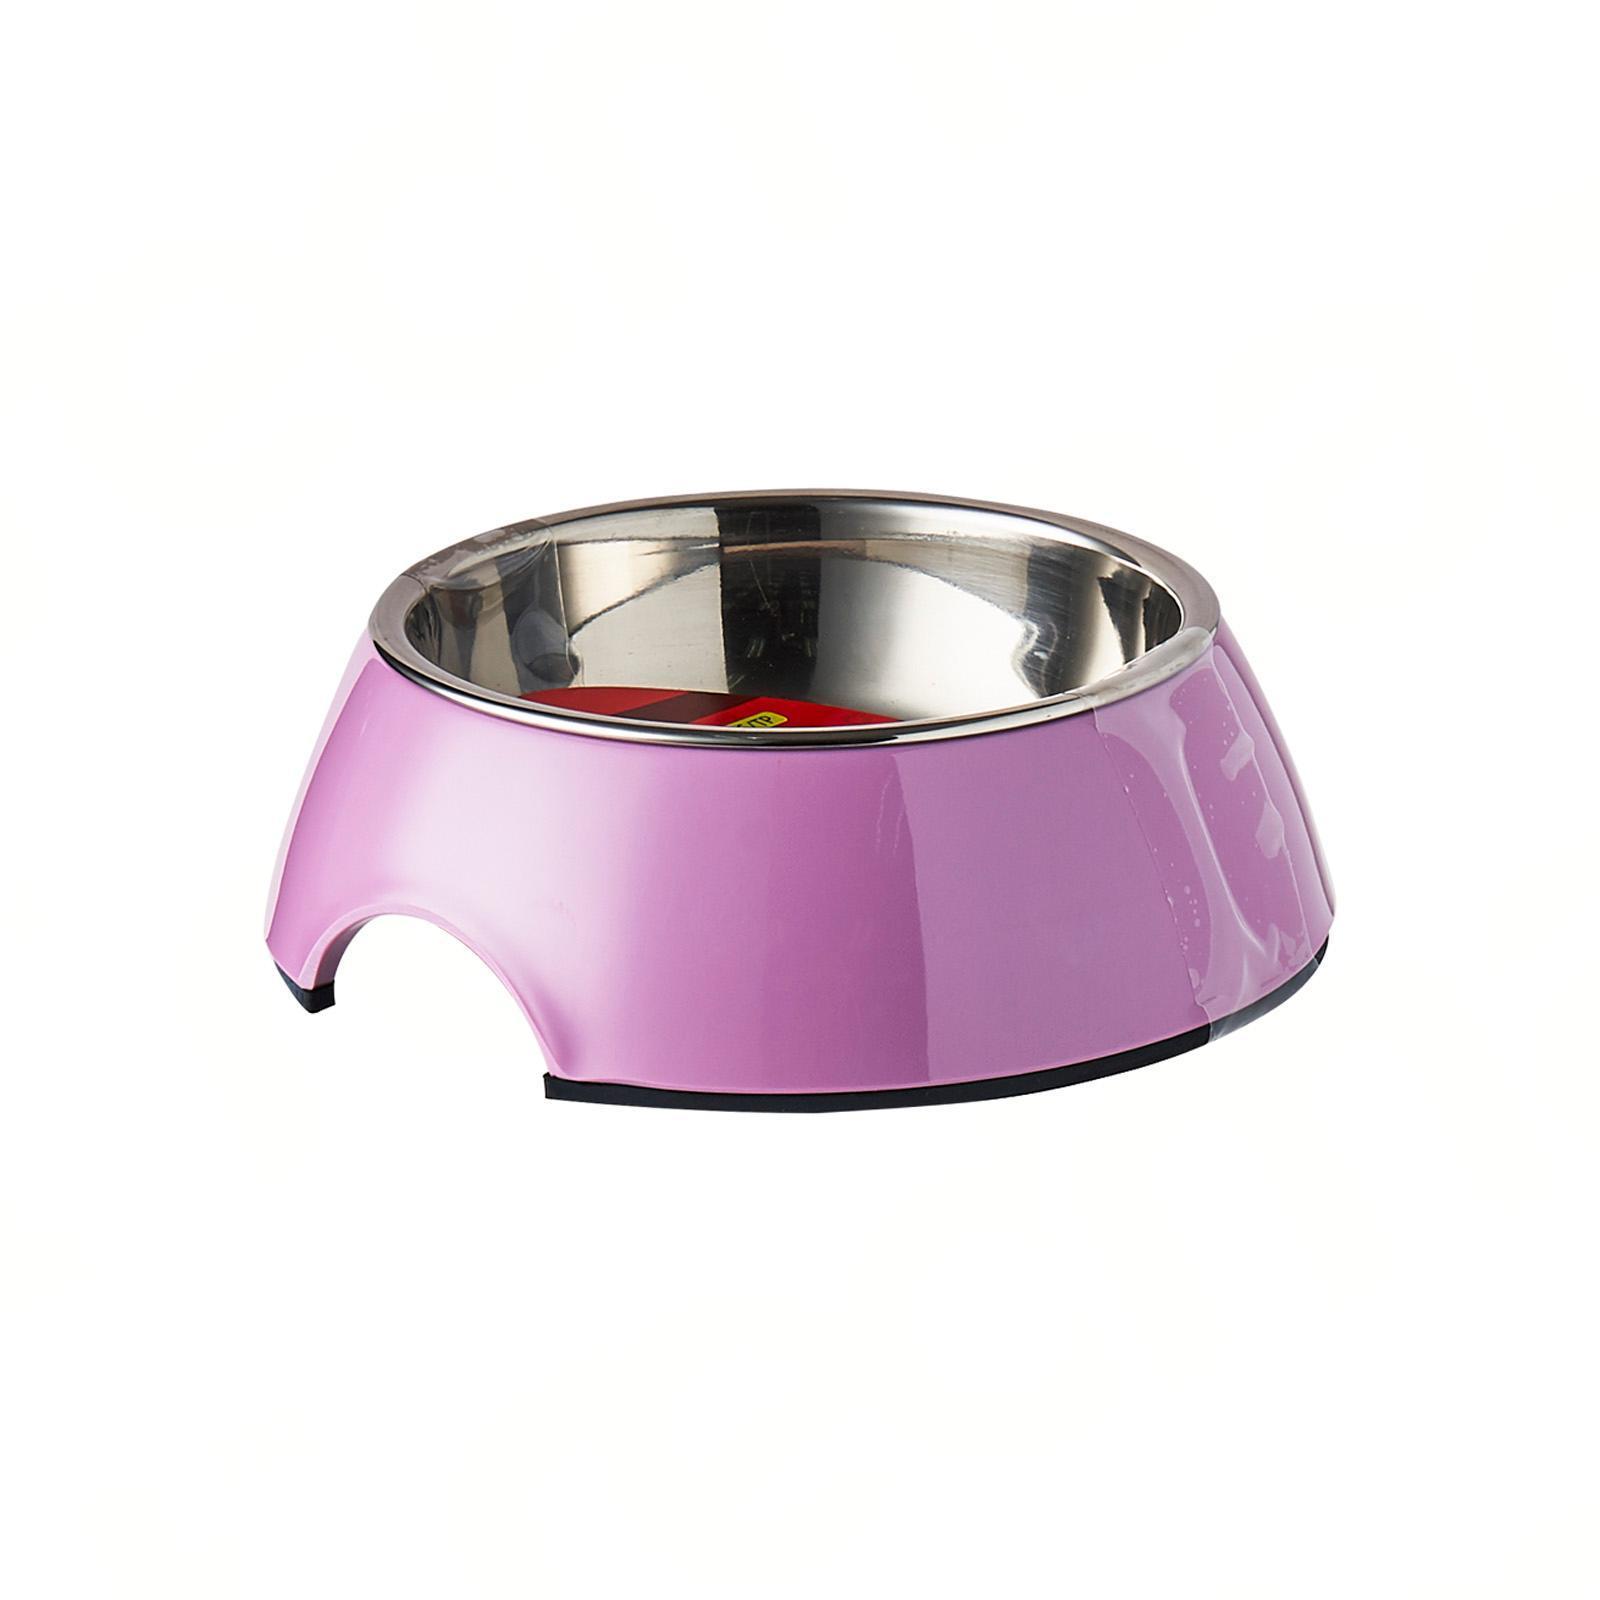 Dogit 2-In-1 Dog Dish- Xsmall Pink (160 Ml/5.4 Fl Oz)